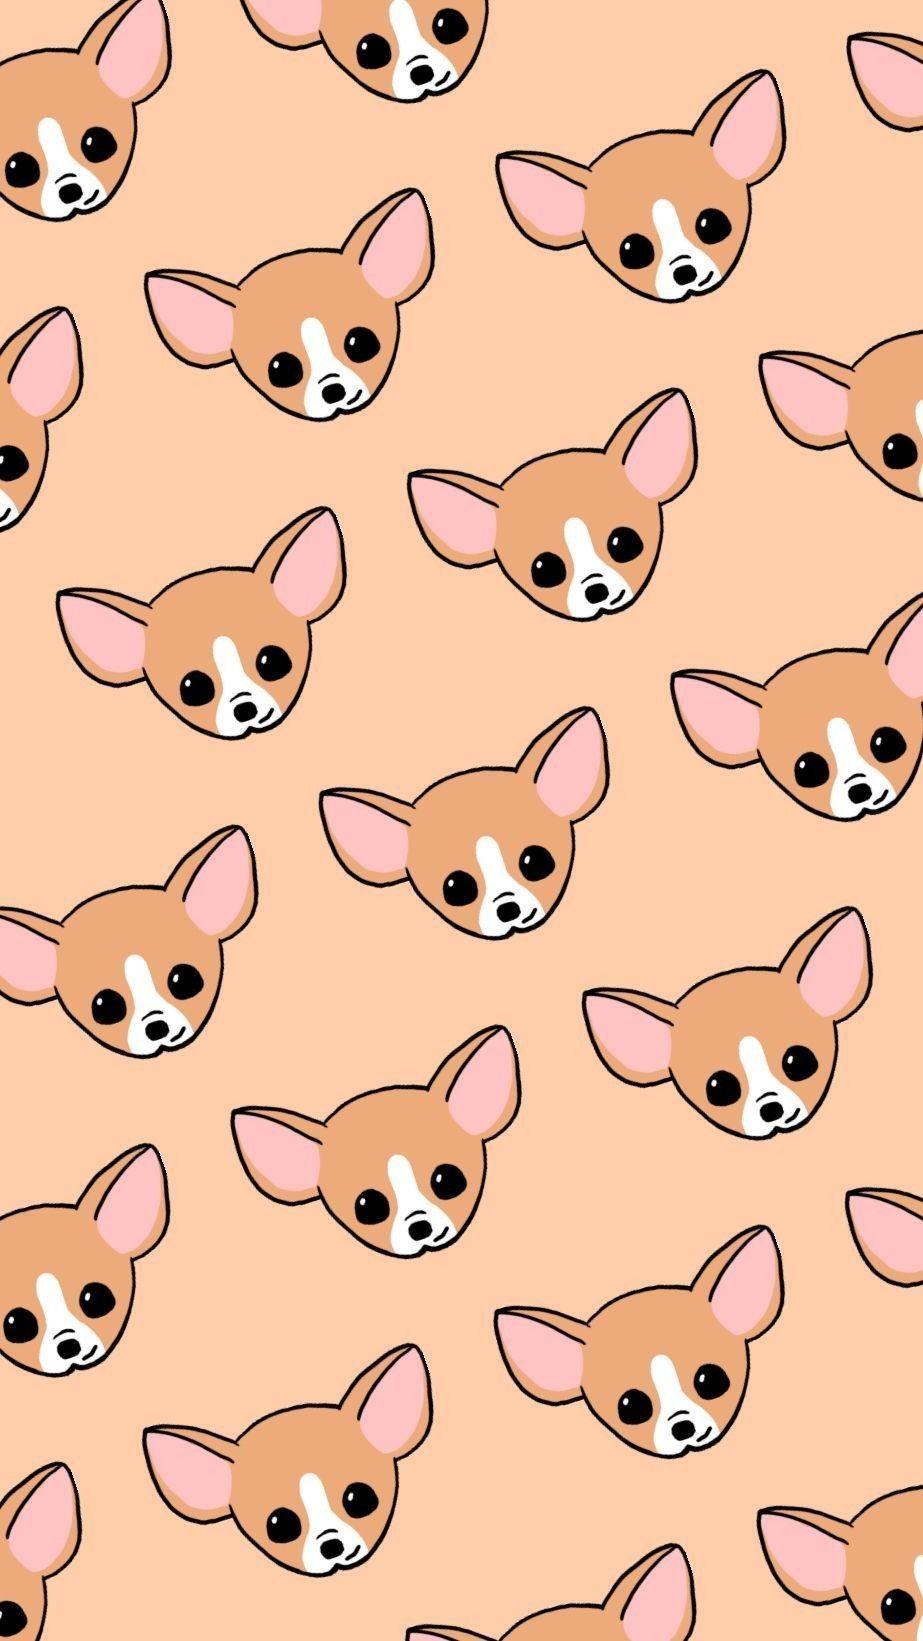 Pet Tips Chihuahua Perros Dibujos Fondos Chihuahua Perros Dibujos Fondos Tatuajes De Perros C Dog Wallpaper Cute Wallpapers Cute Wallpaper Backgrounds